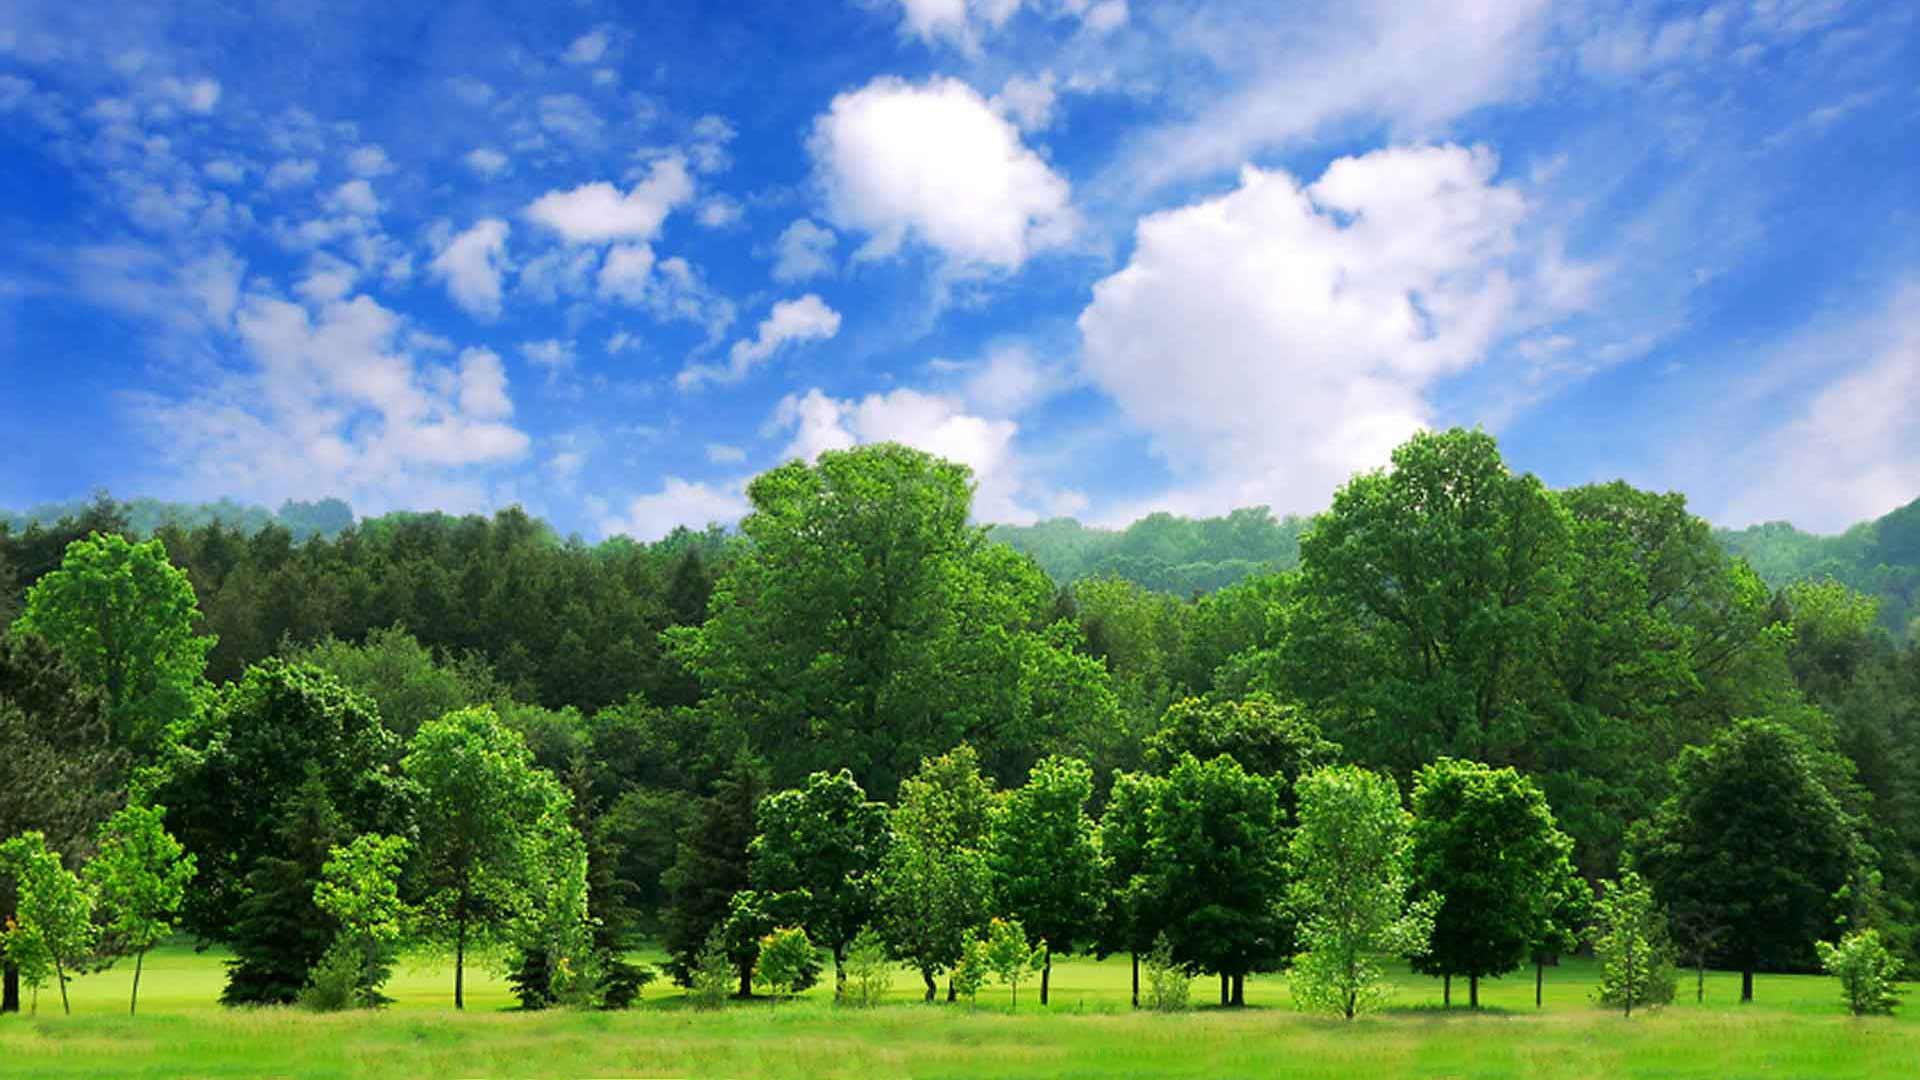 Enterprise Holdings 50 Million Tree Pledge